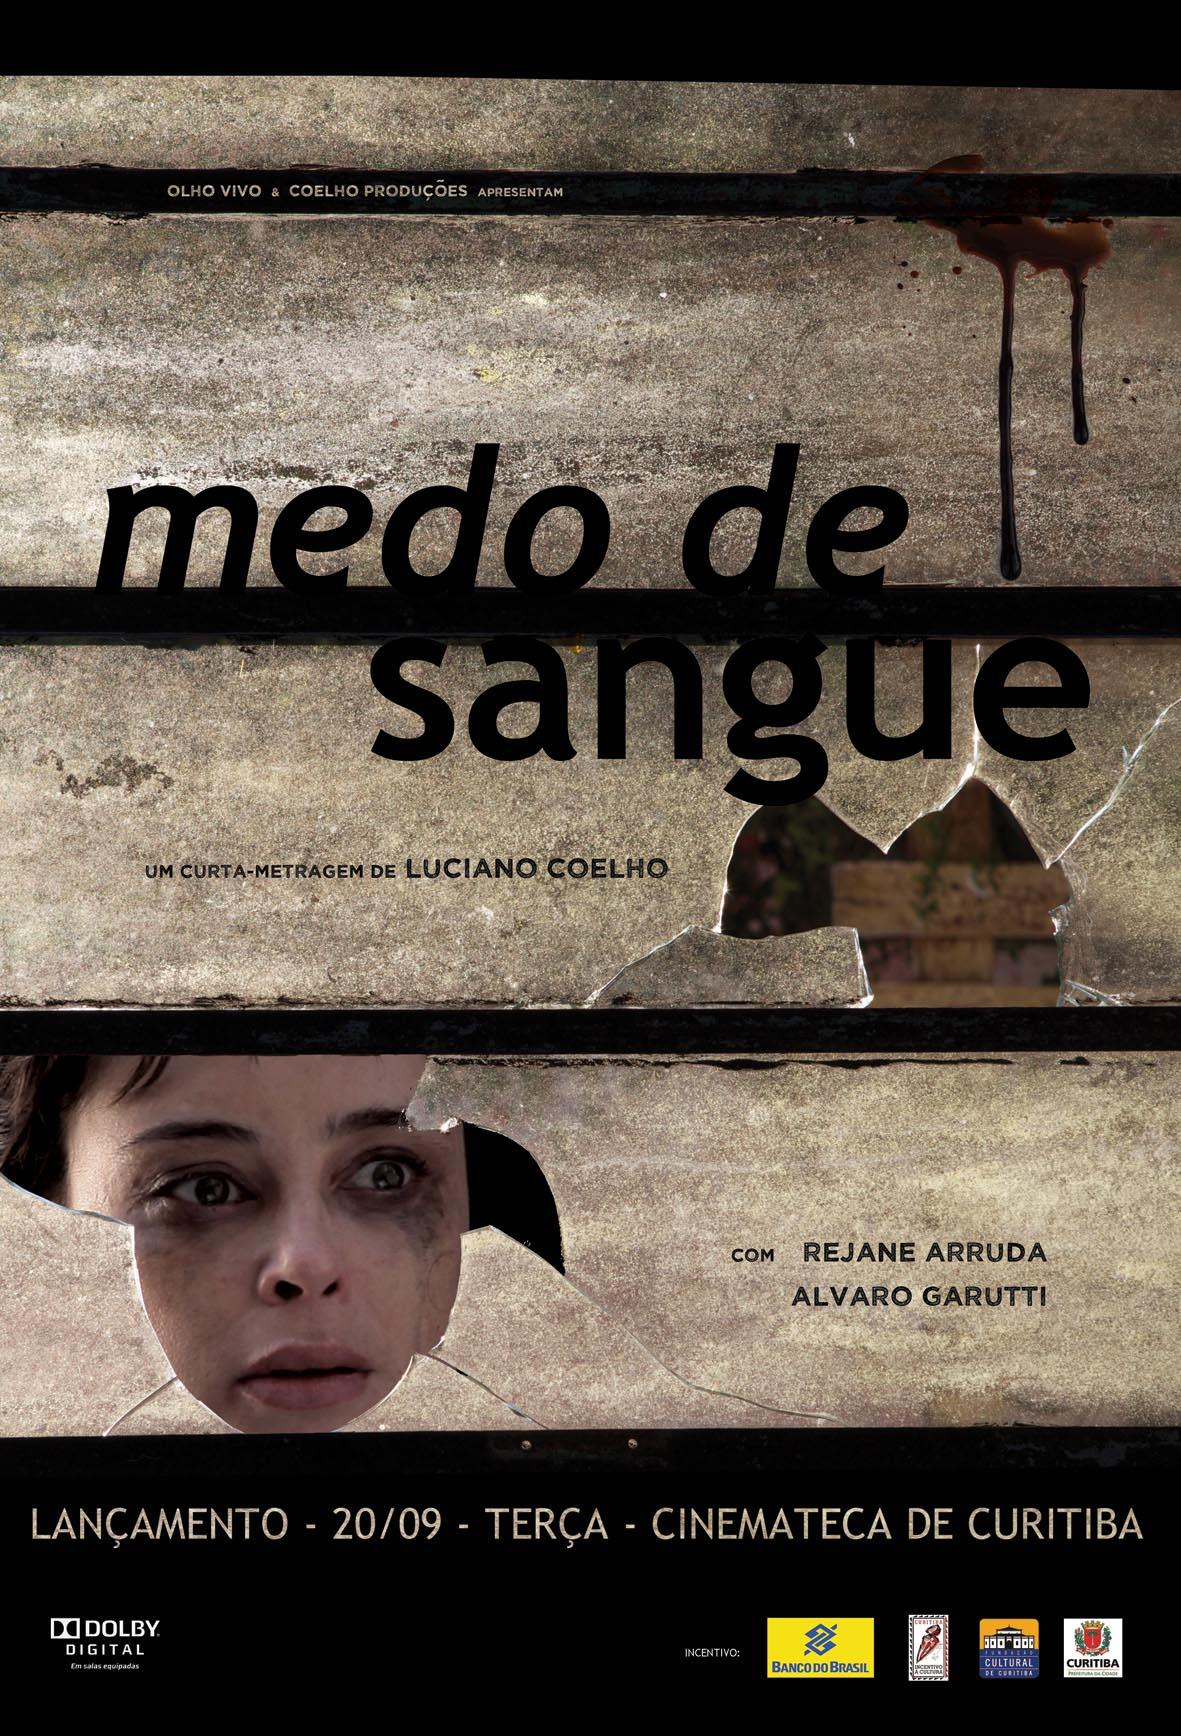 MEDO DE SANGUE (2012)